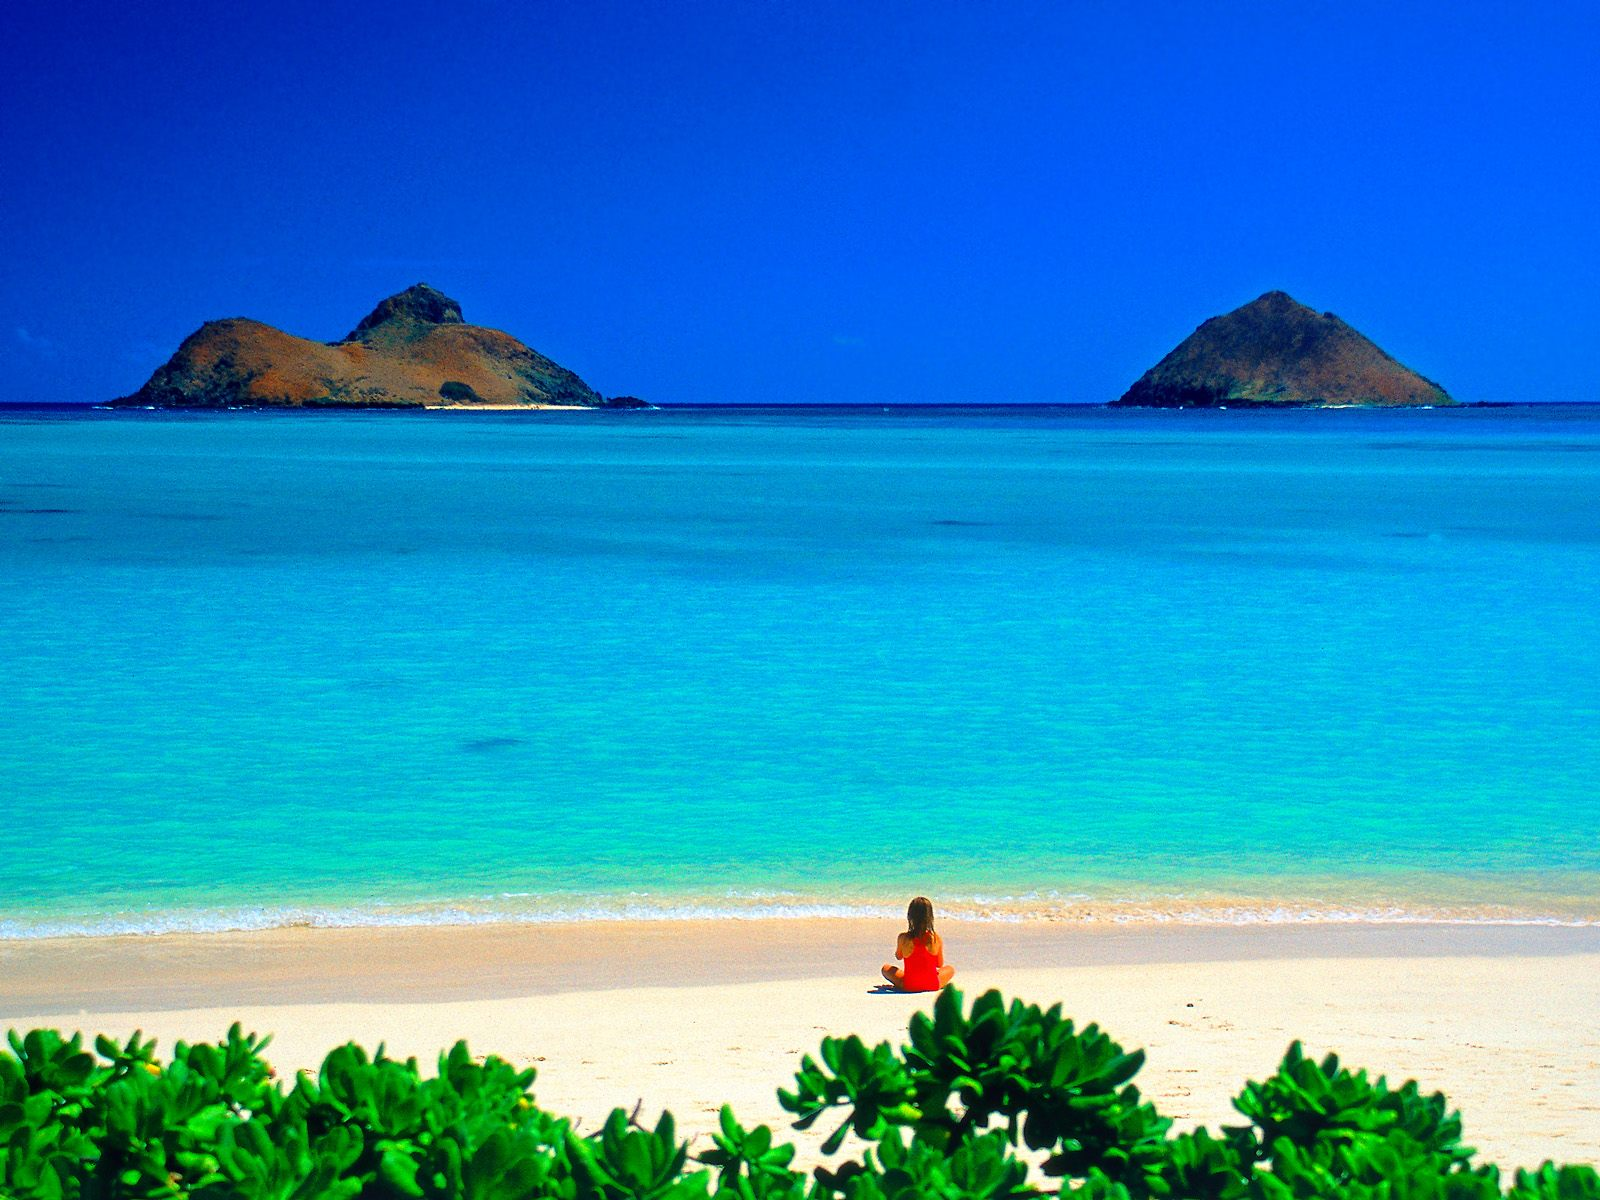 hawaii beach pictures hawaii beach photos hawaii beach photos hawaii